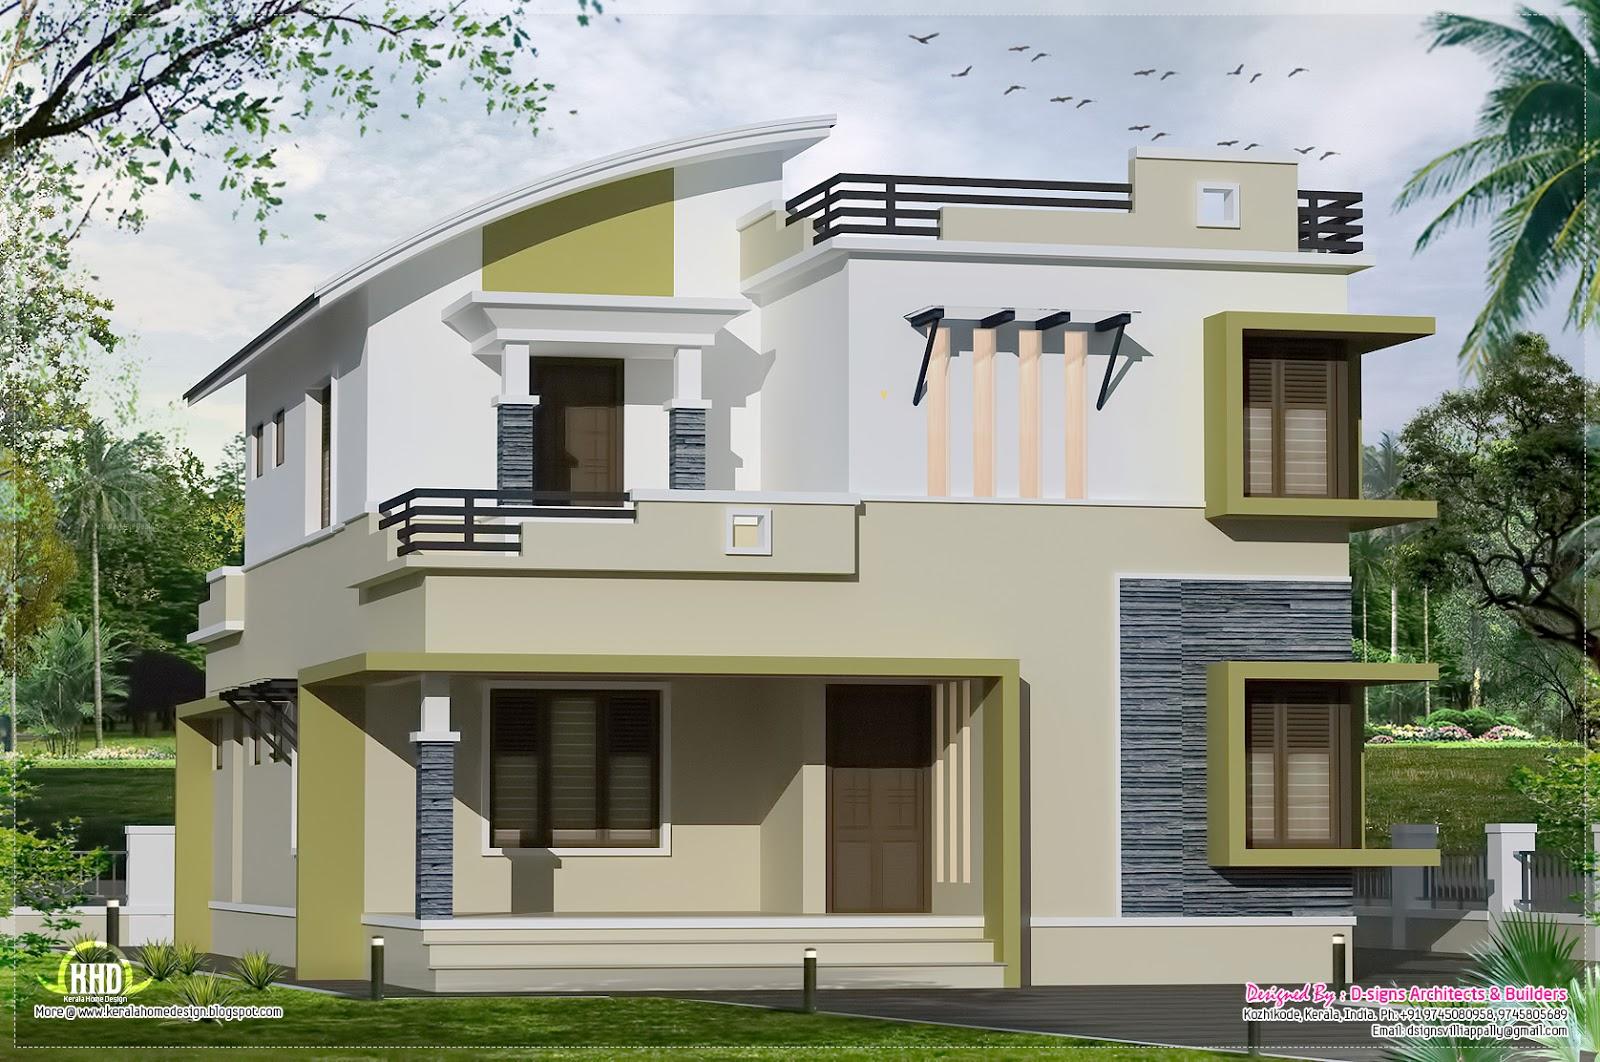 India House Balcony Designs Zion Star